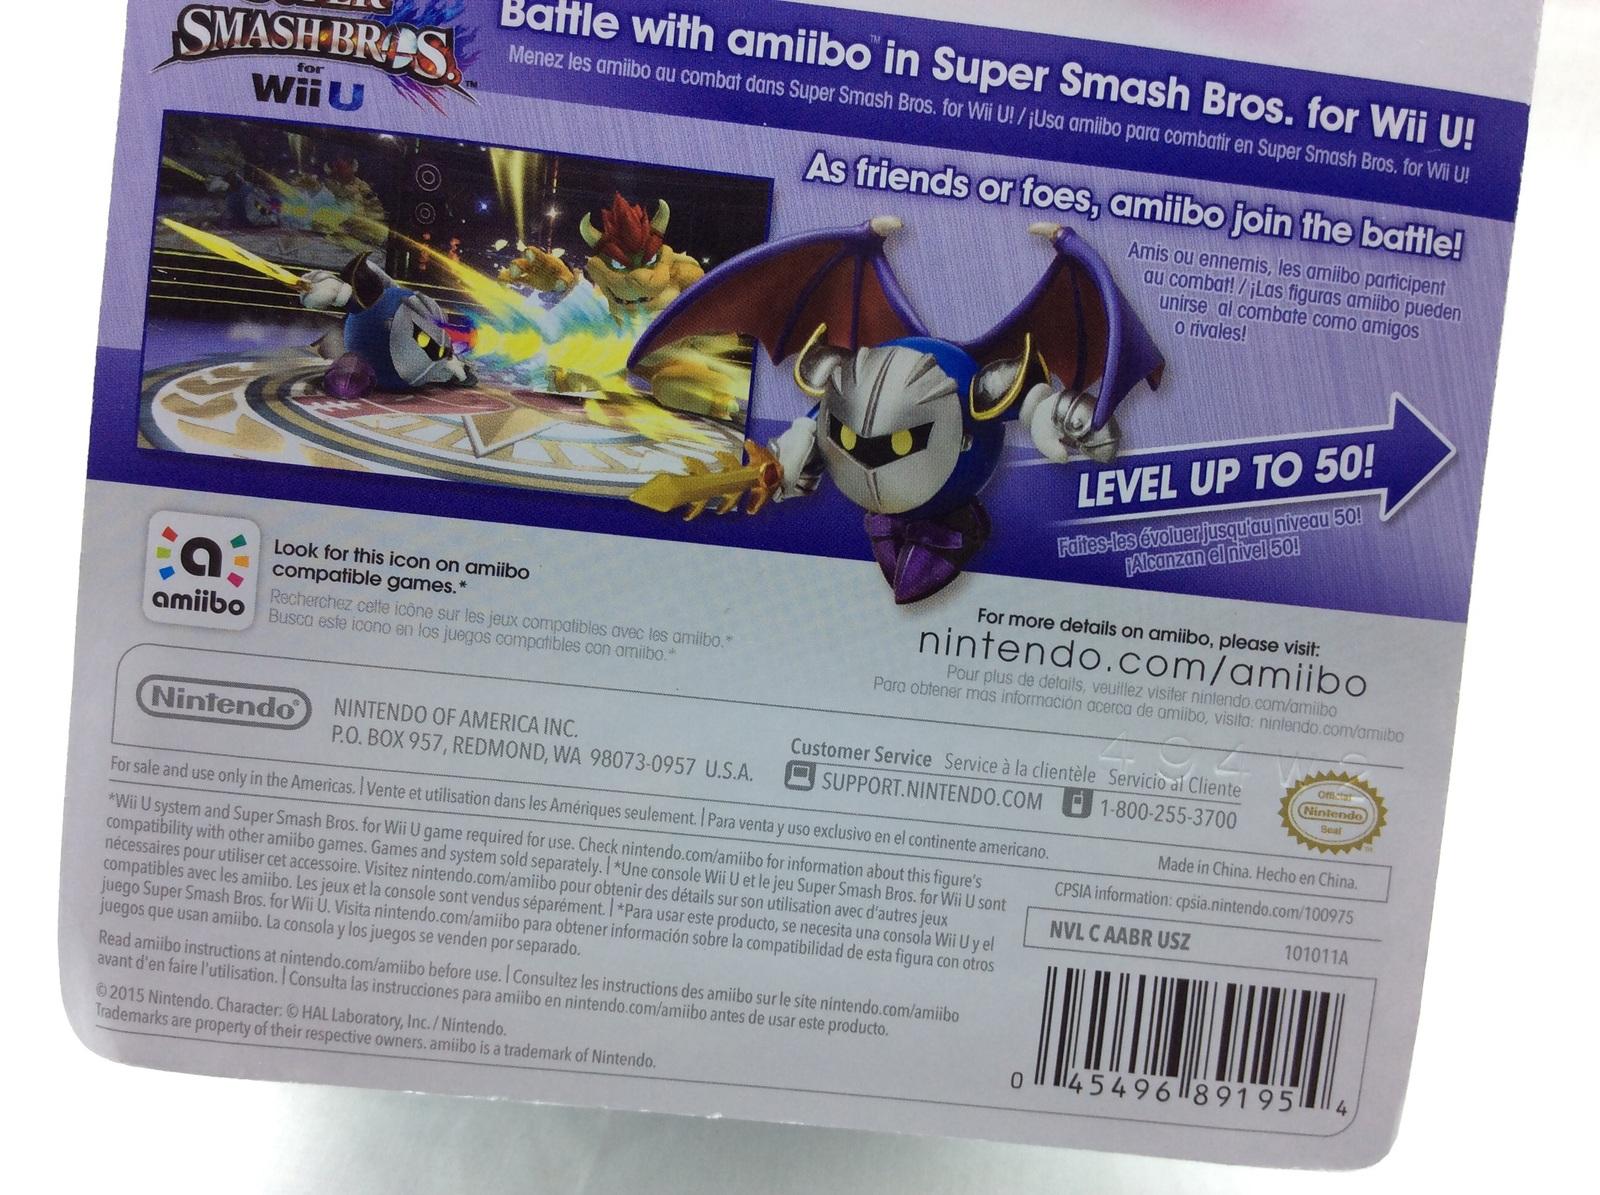 Amiibo Meta Knight Super Smash Bros. USA Best Buy Exclusive Amiibo Wii U 3DS